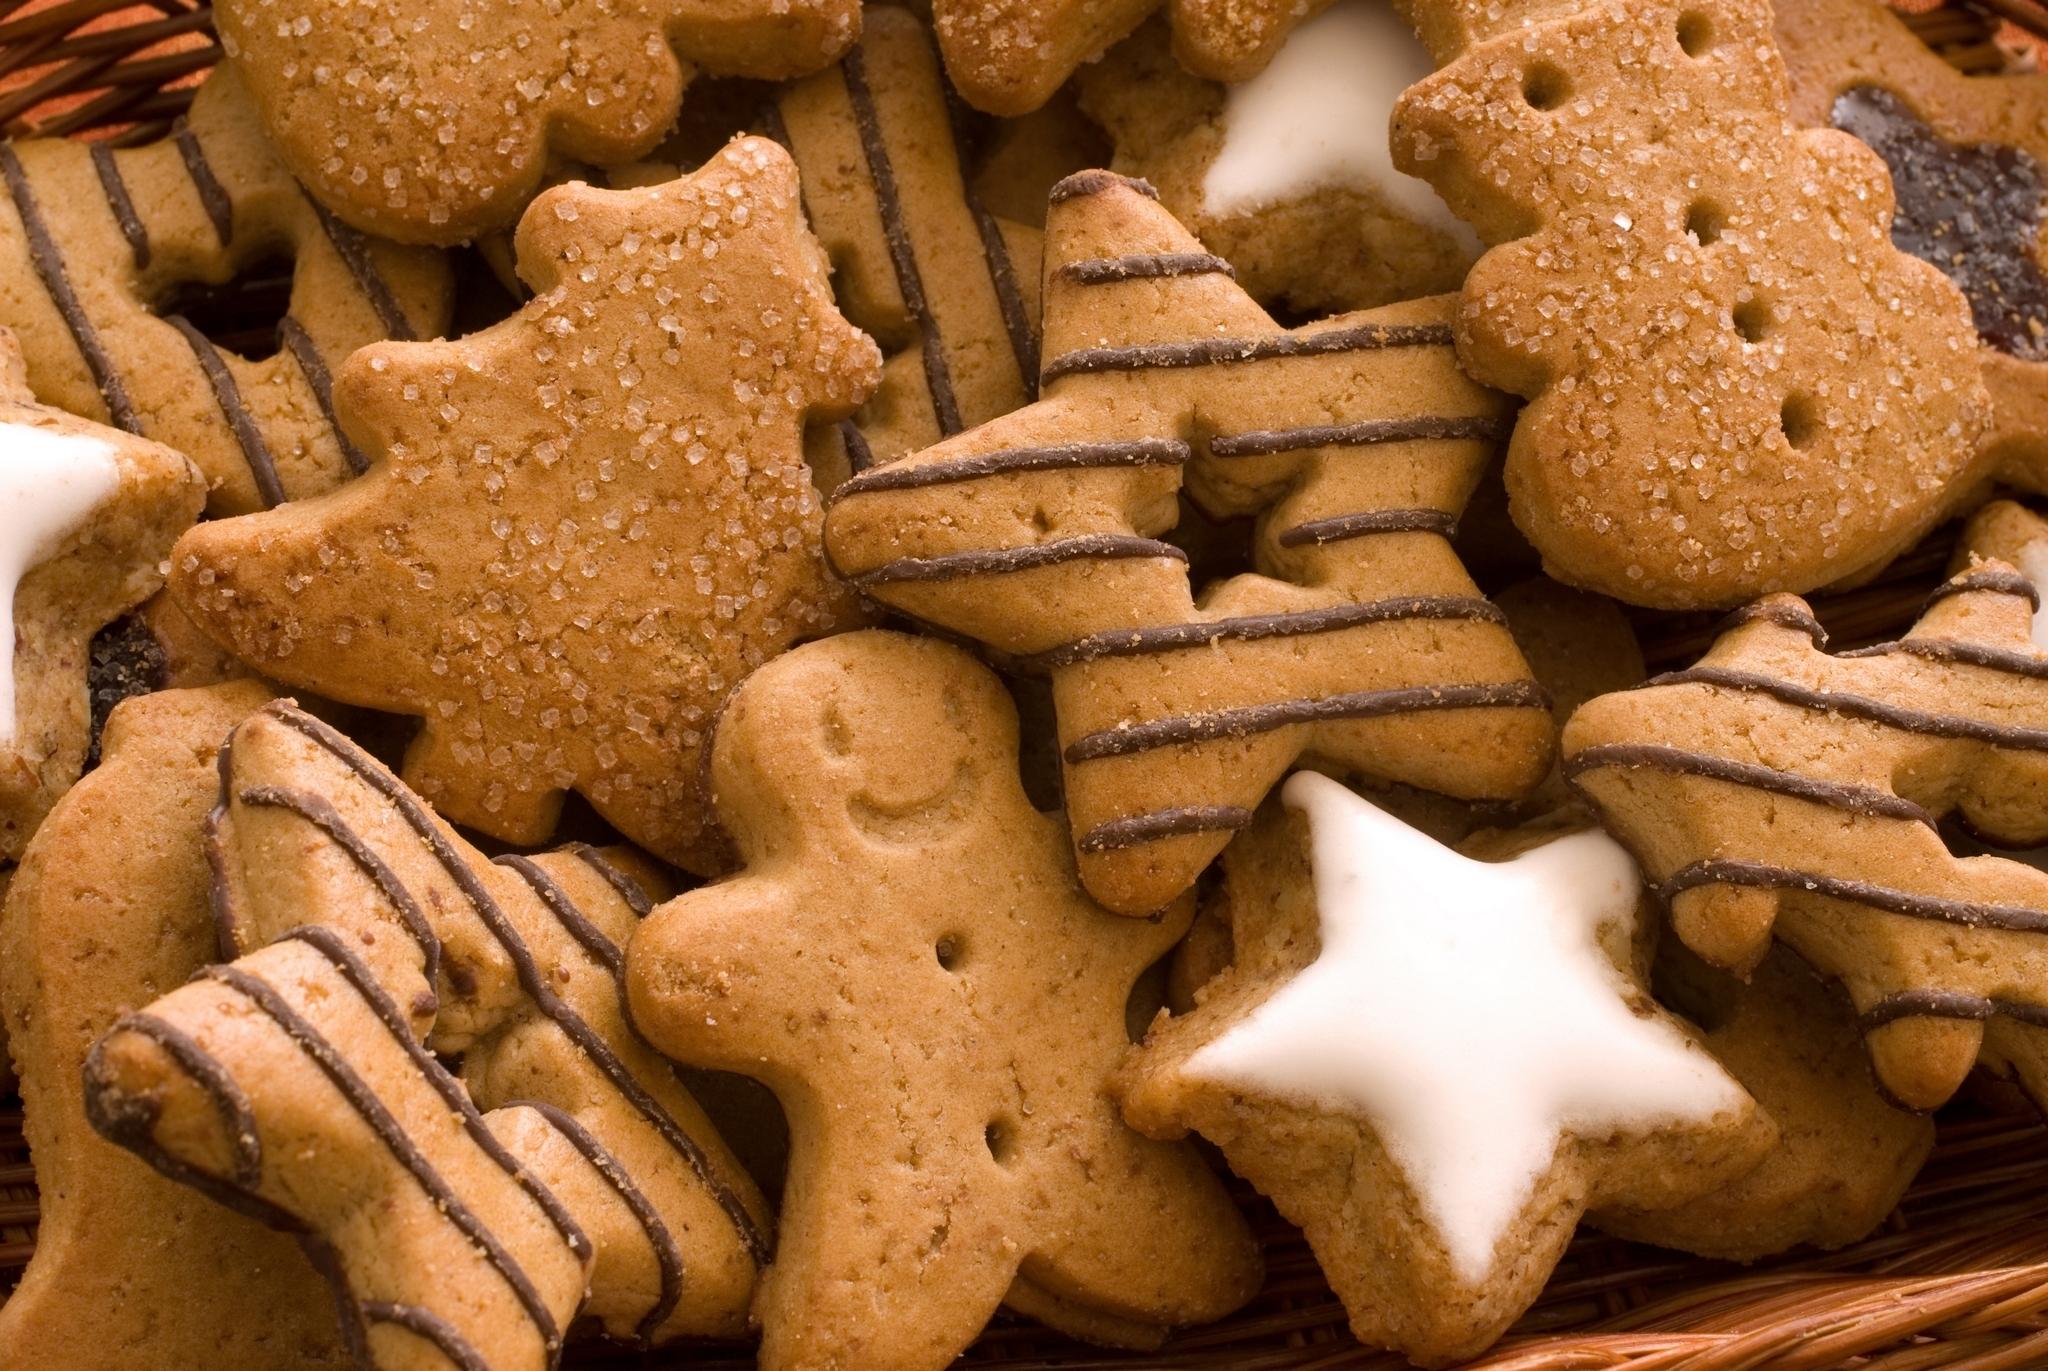 печенье звезды тарелка  № 2926894 бесплатно